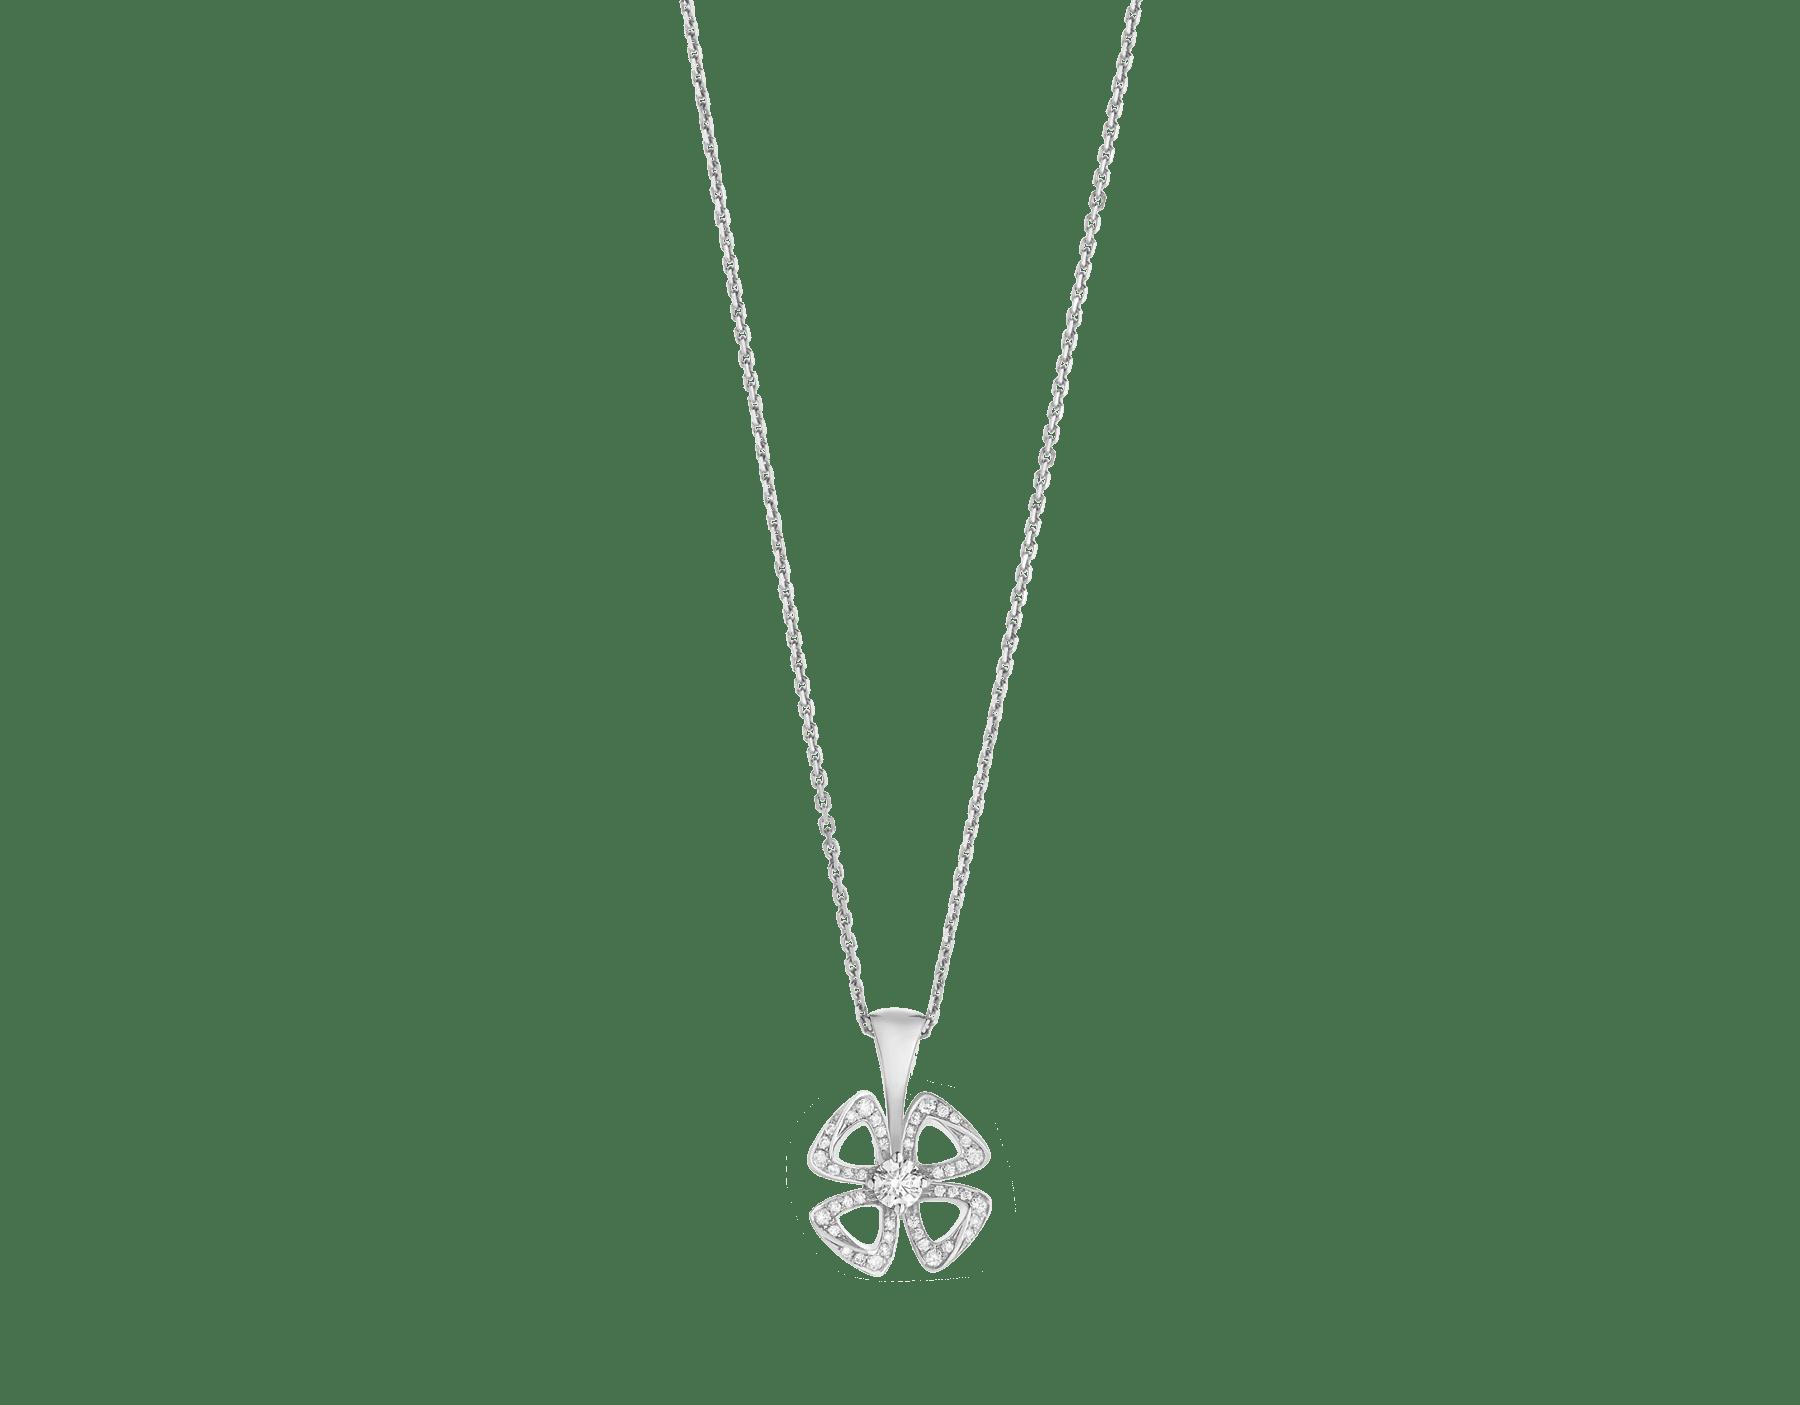 Fiorever 18K 白金項鍊,鑲飾 1 顆明亮型切割鑽石(0.10 克拉)和密鑲鑽石(0.06 克拉)。 358157 image 1